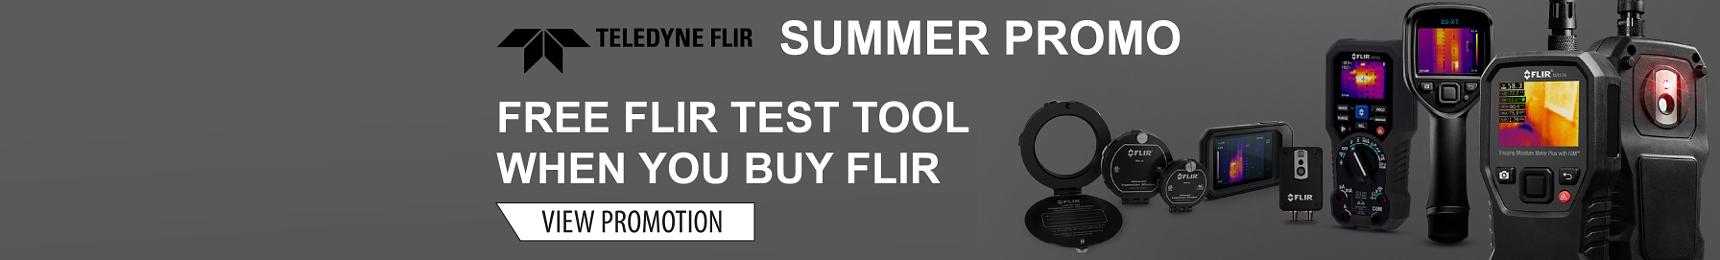 FLIR Summer Promotion on AcutestDirect